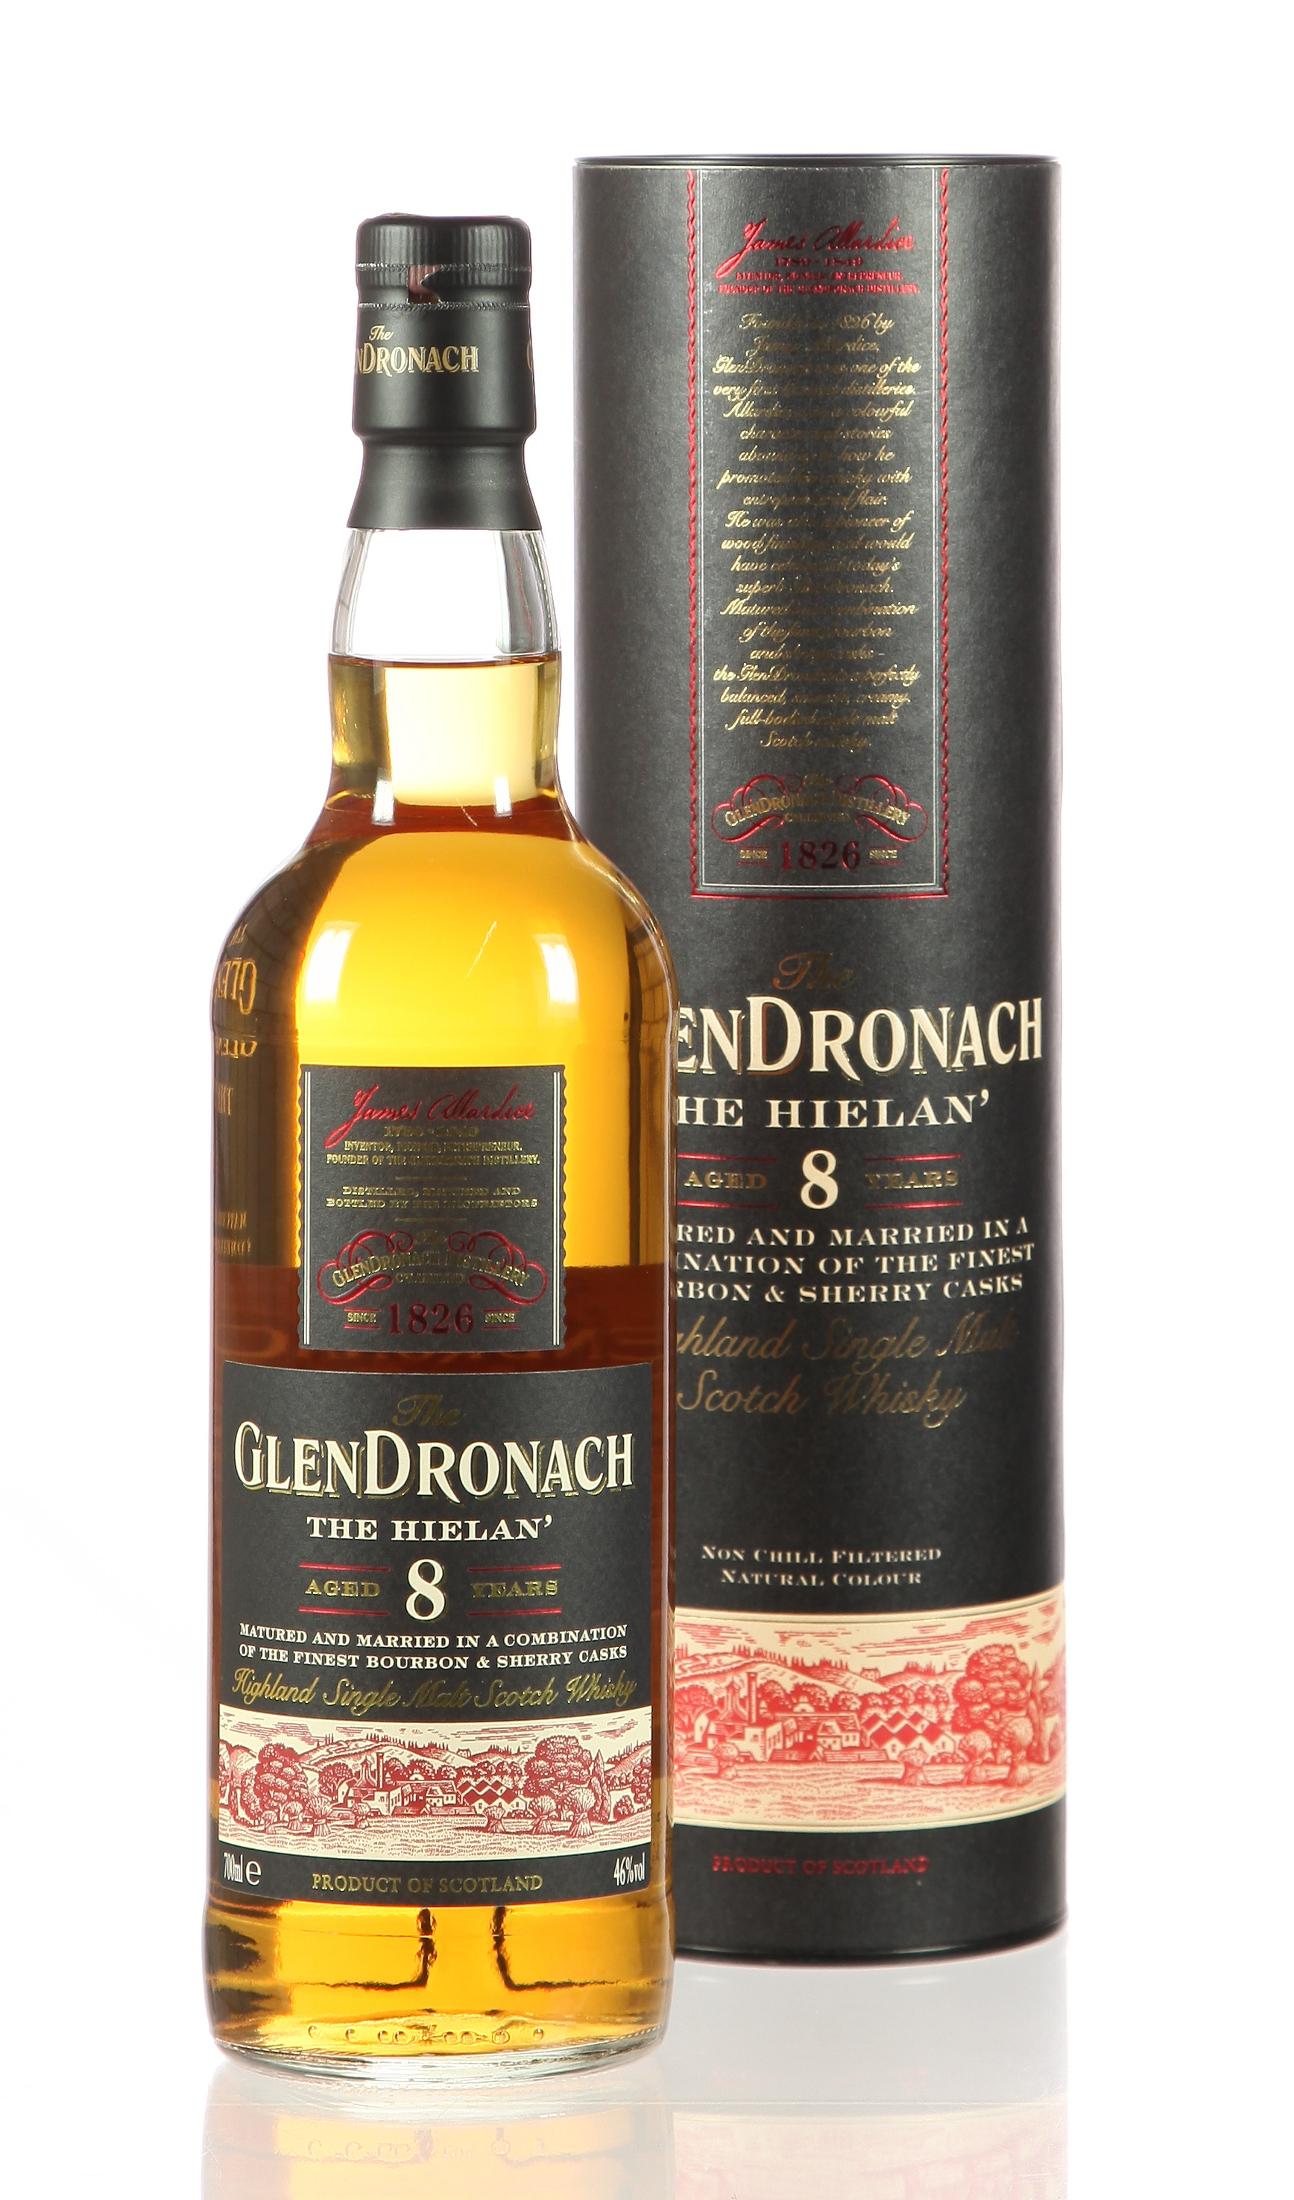 Glendronach The Hielan